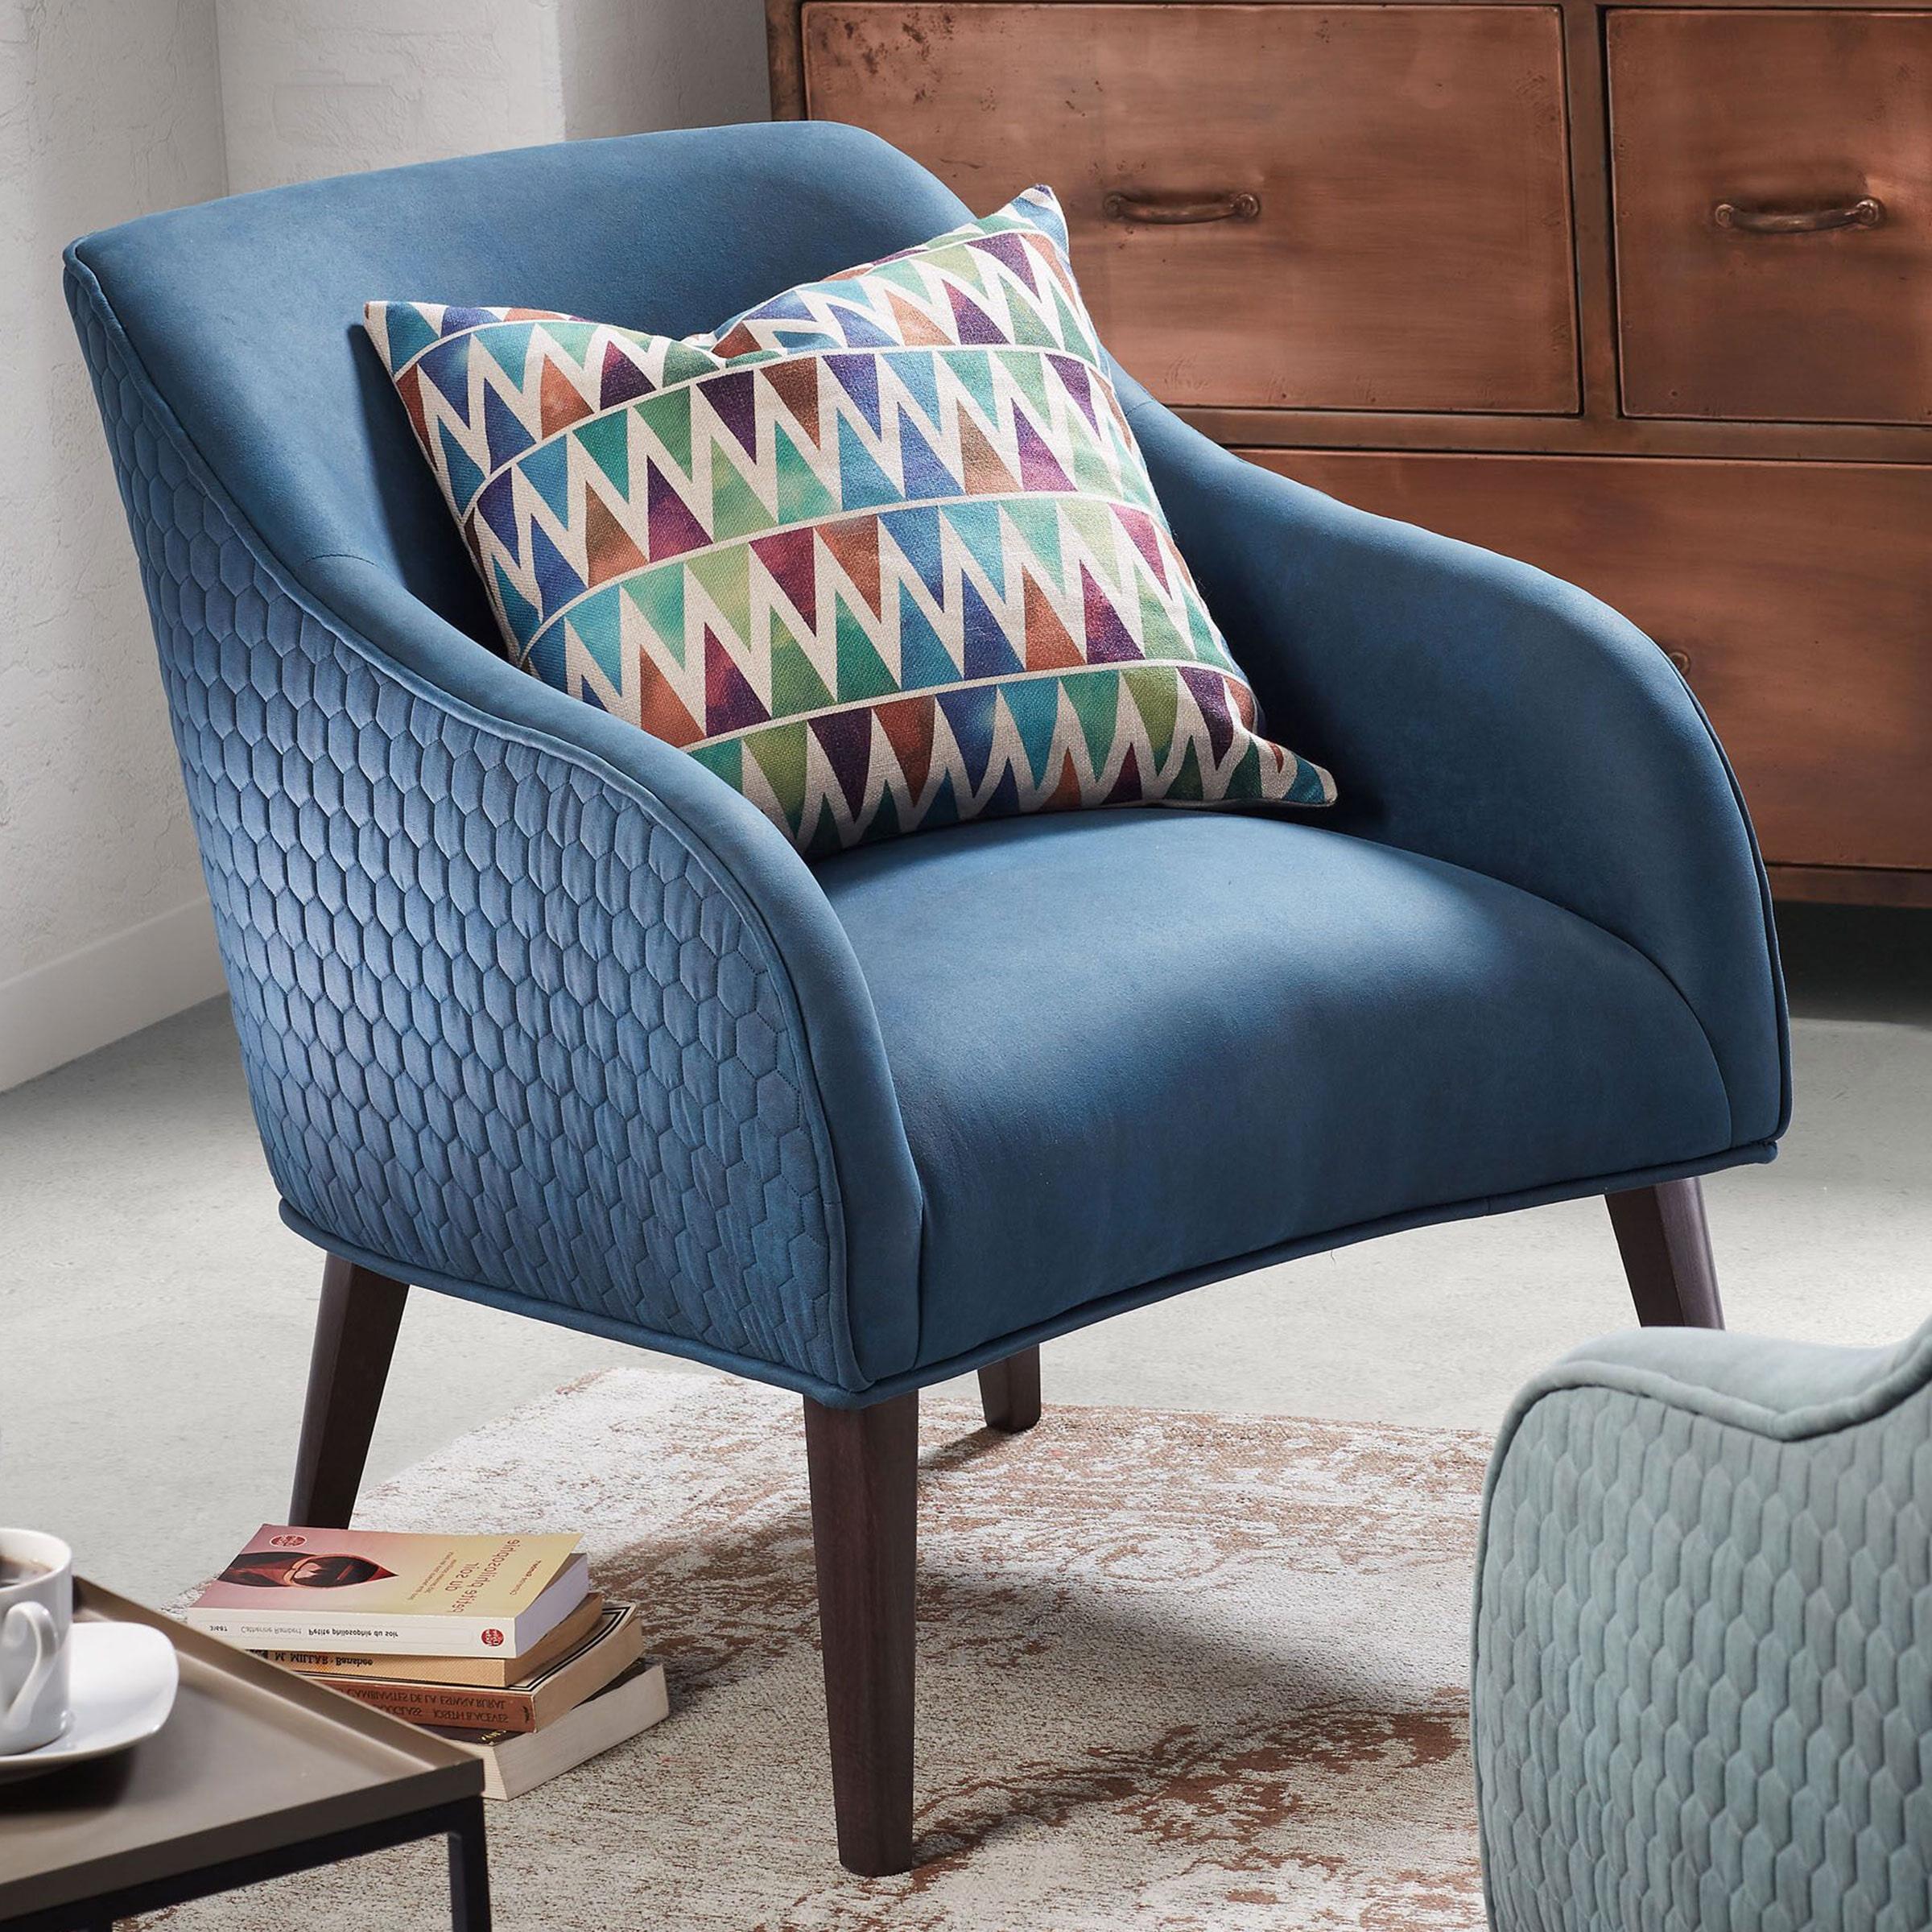 Kave Home fauteuil 'Bobly', kleur blauw